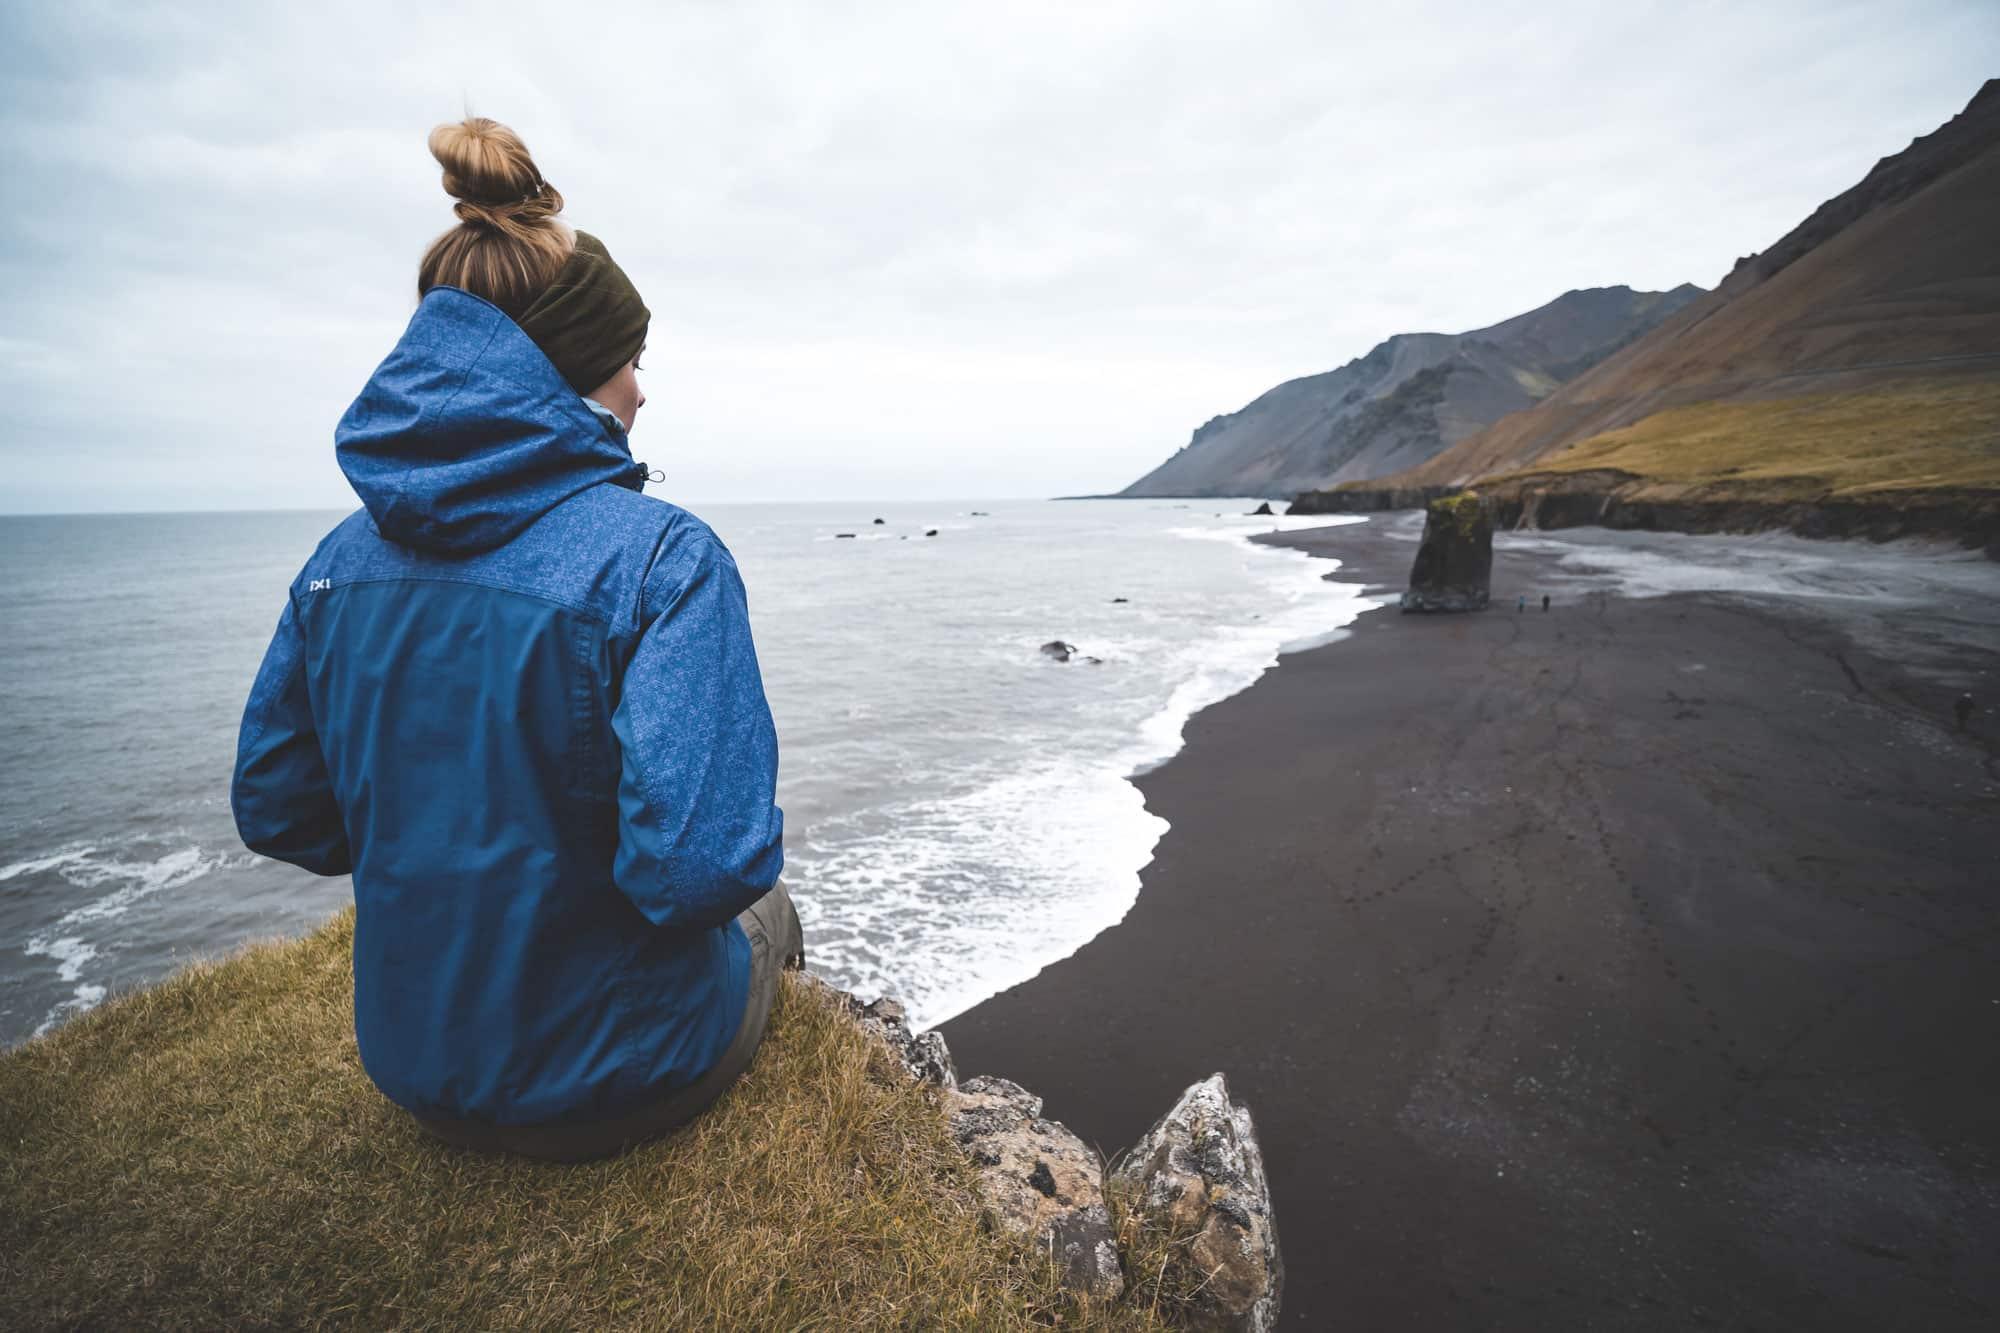 Mujer viajando sola, contempla paisaje Islandia